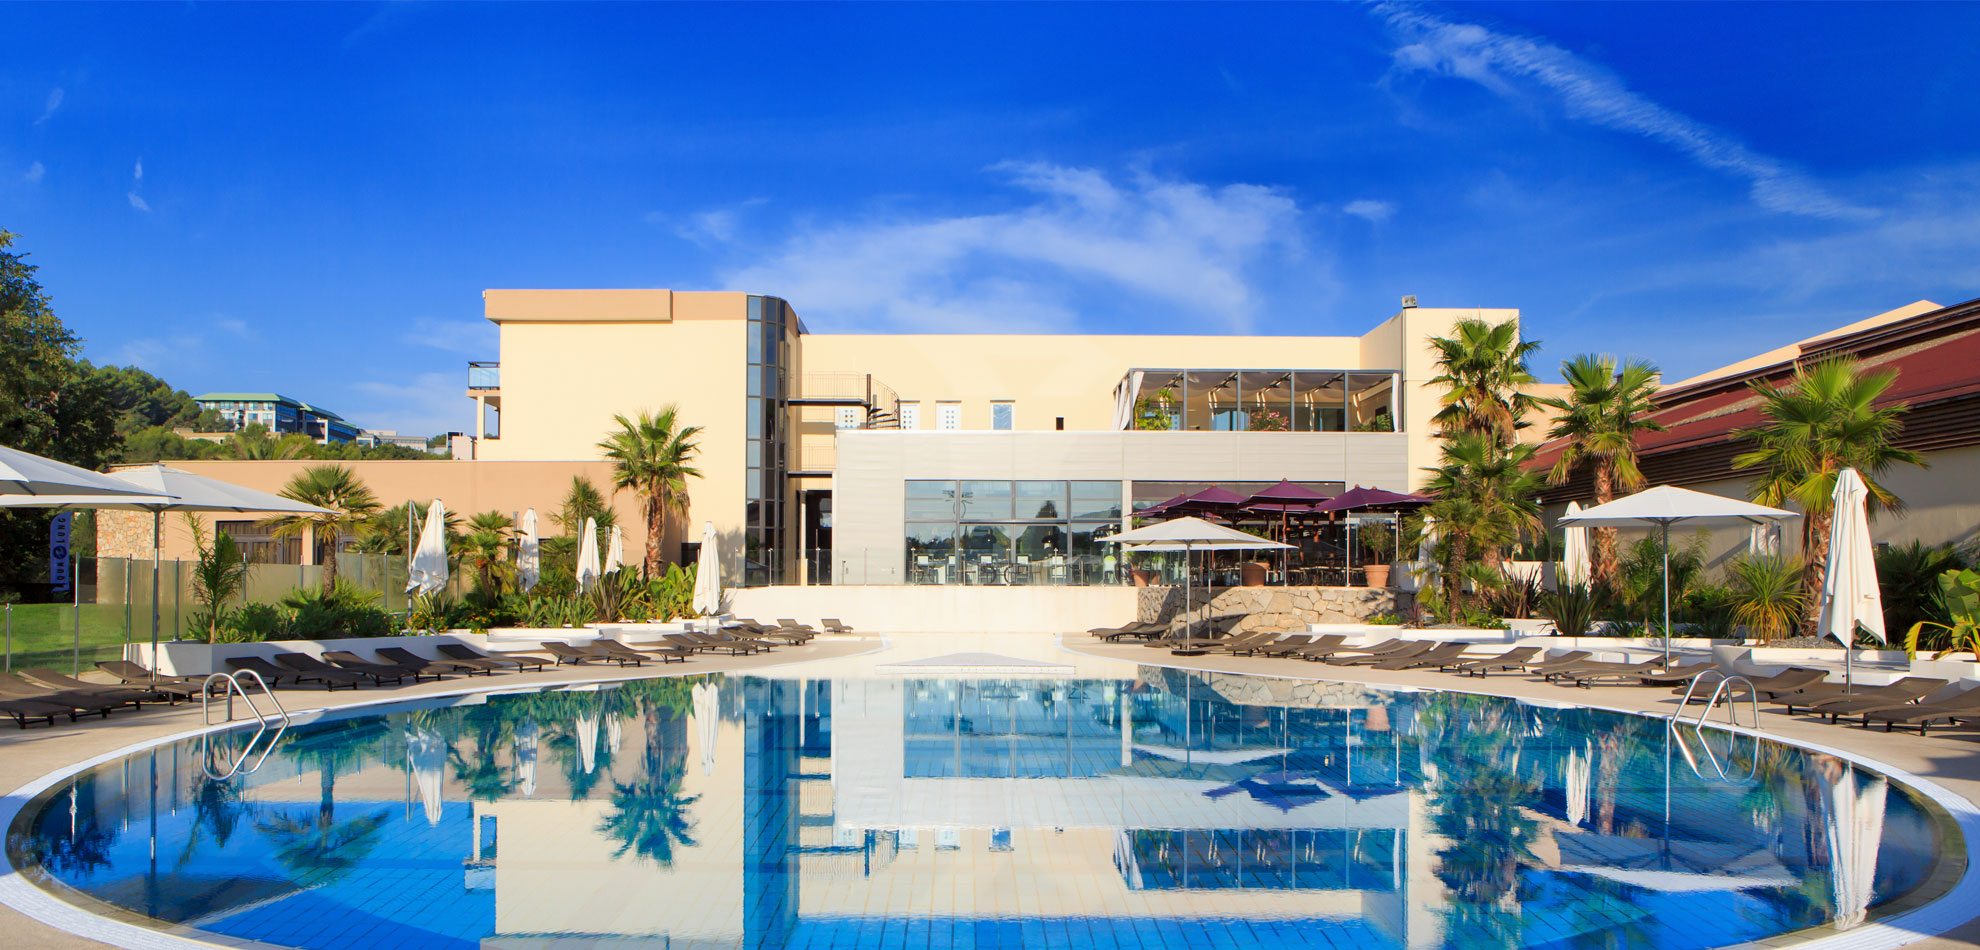 Sophia Country Club Hotel Resort & Spa (06)